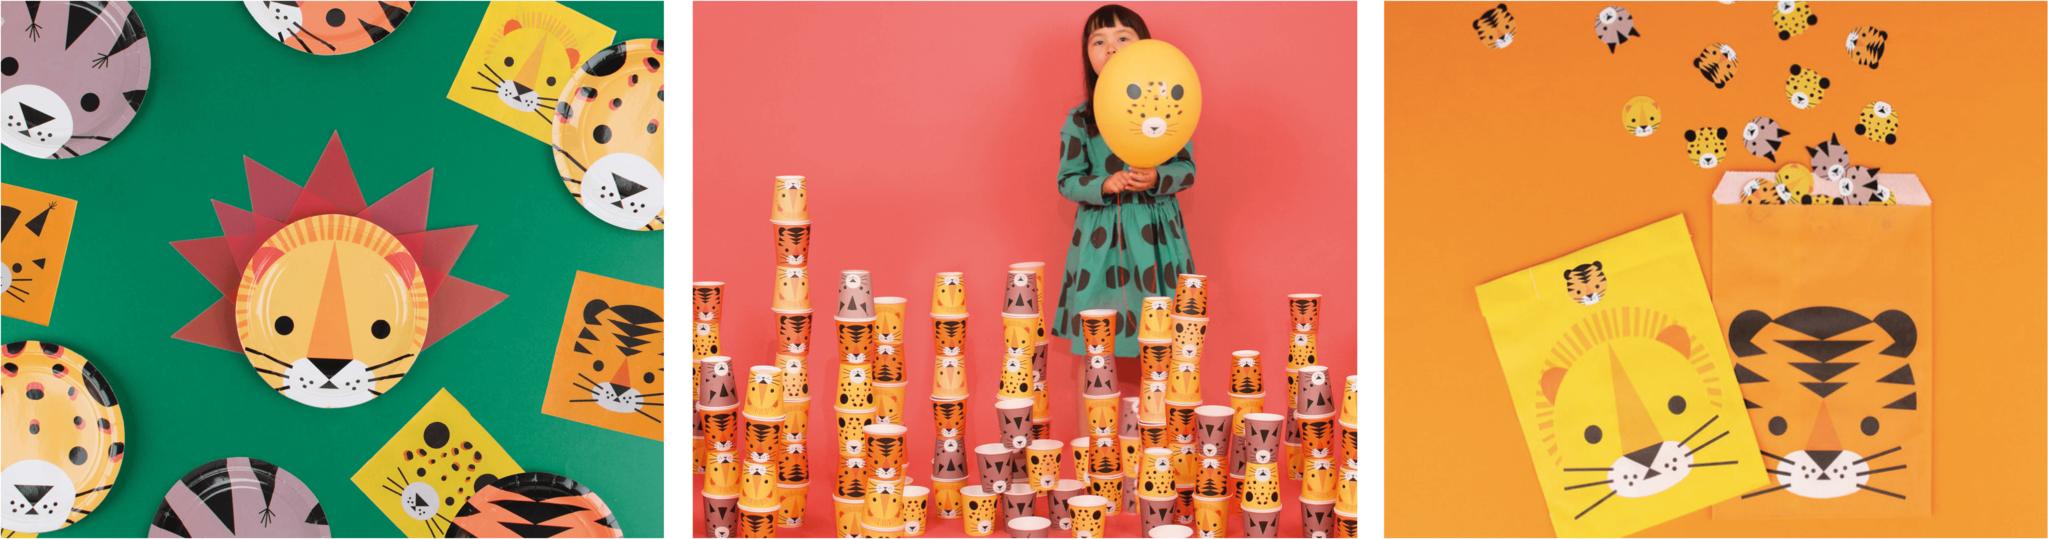 Kinderfeestje versiering thema jungle dieren